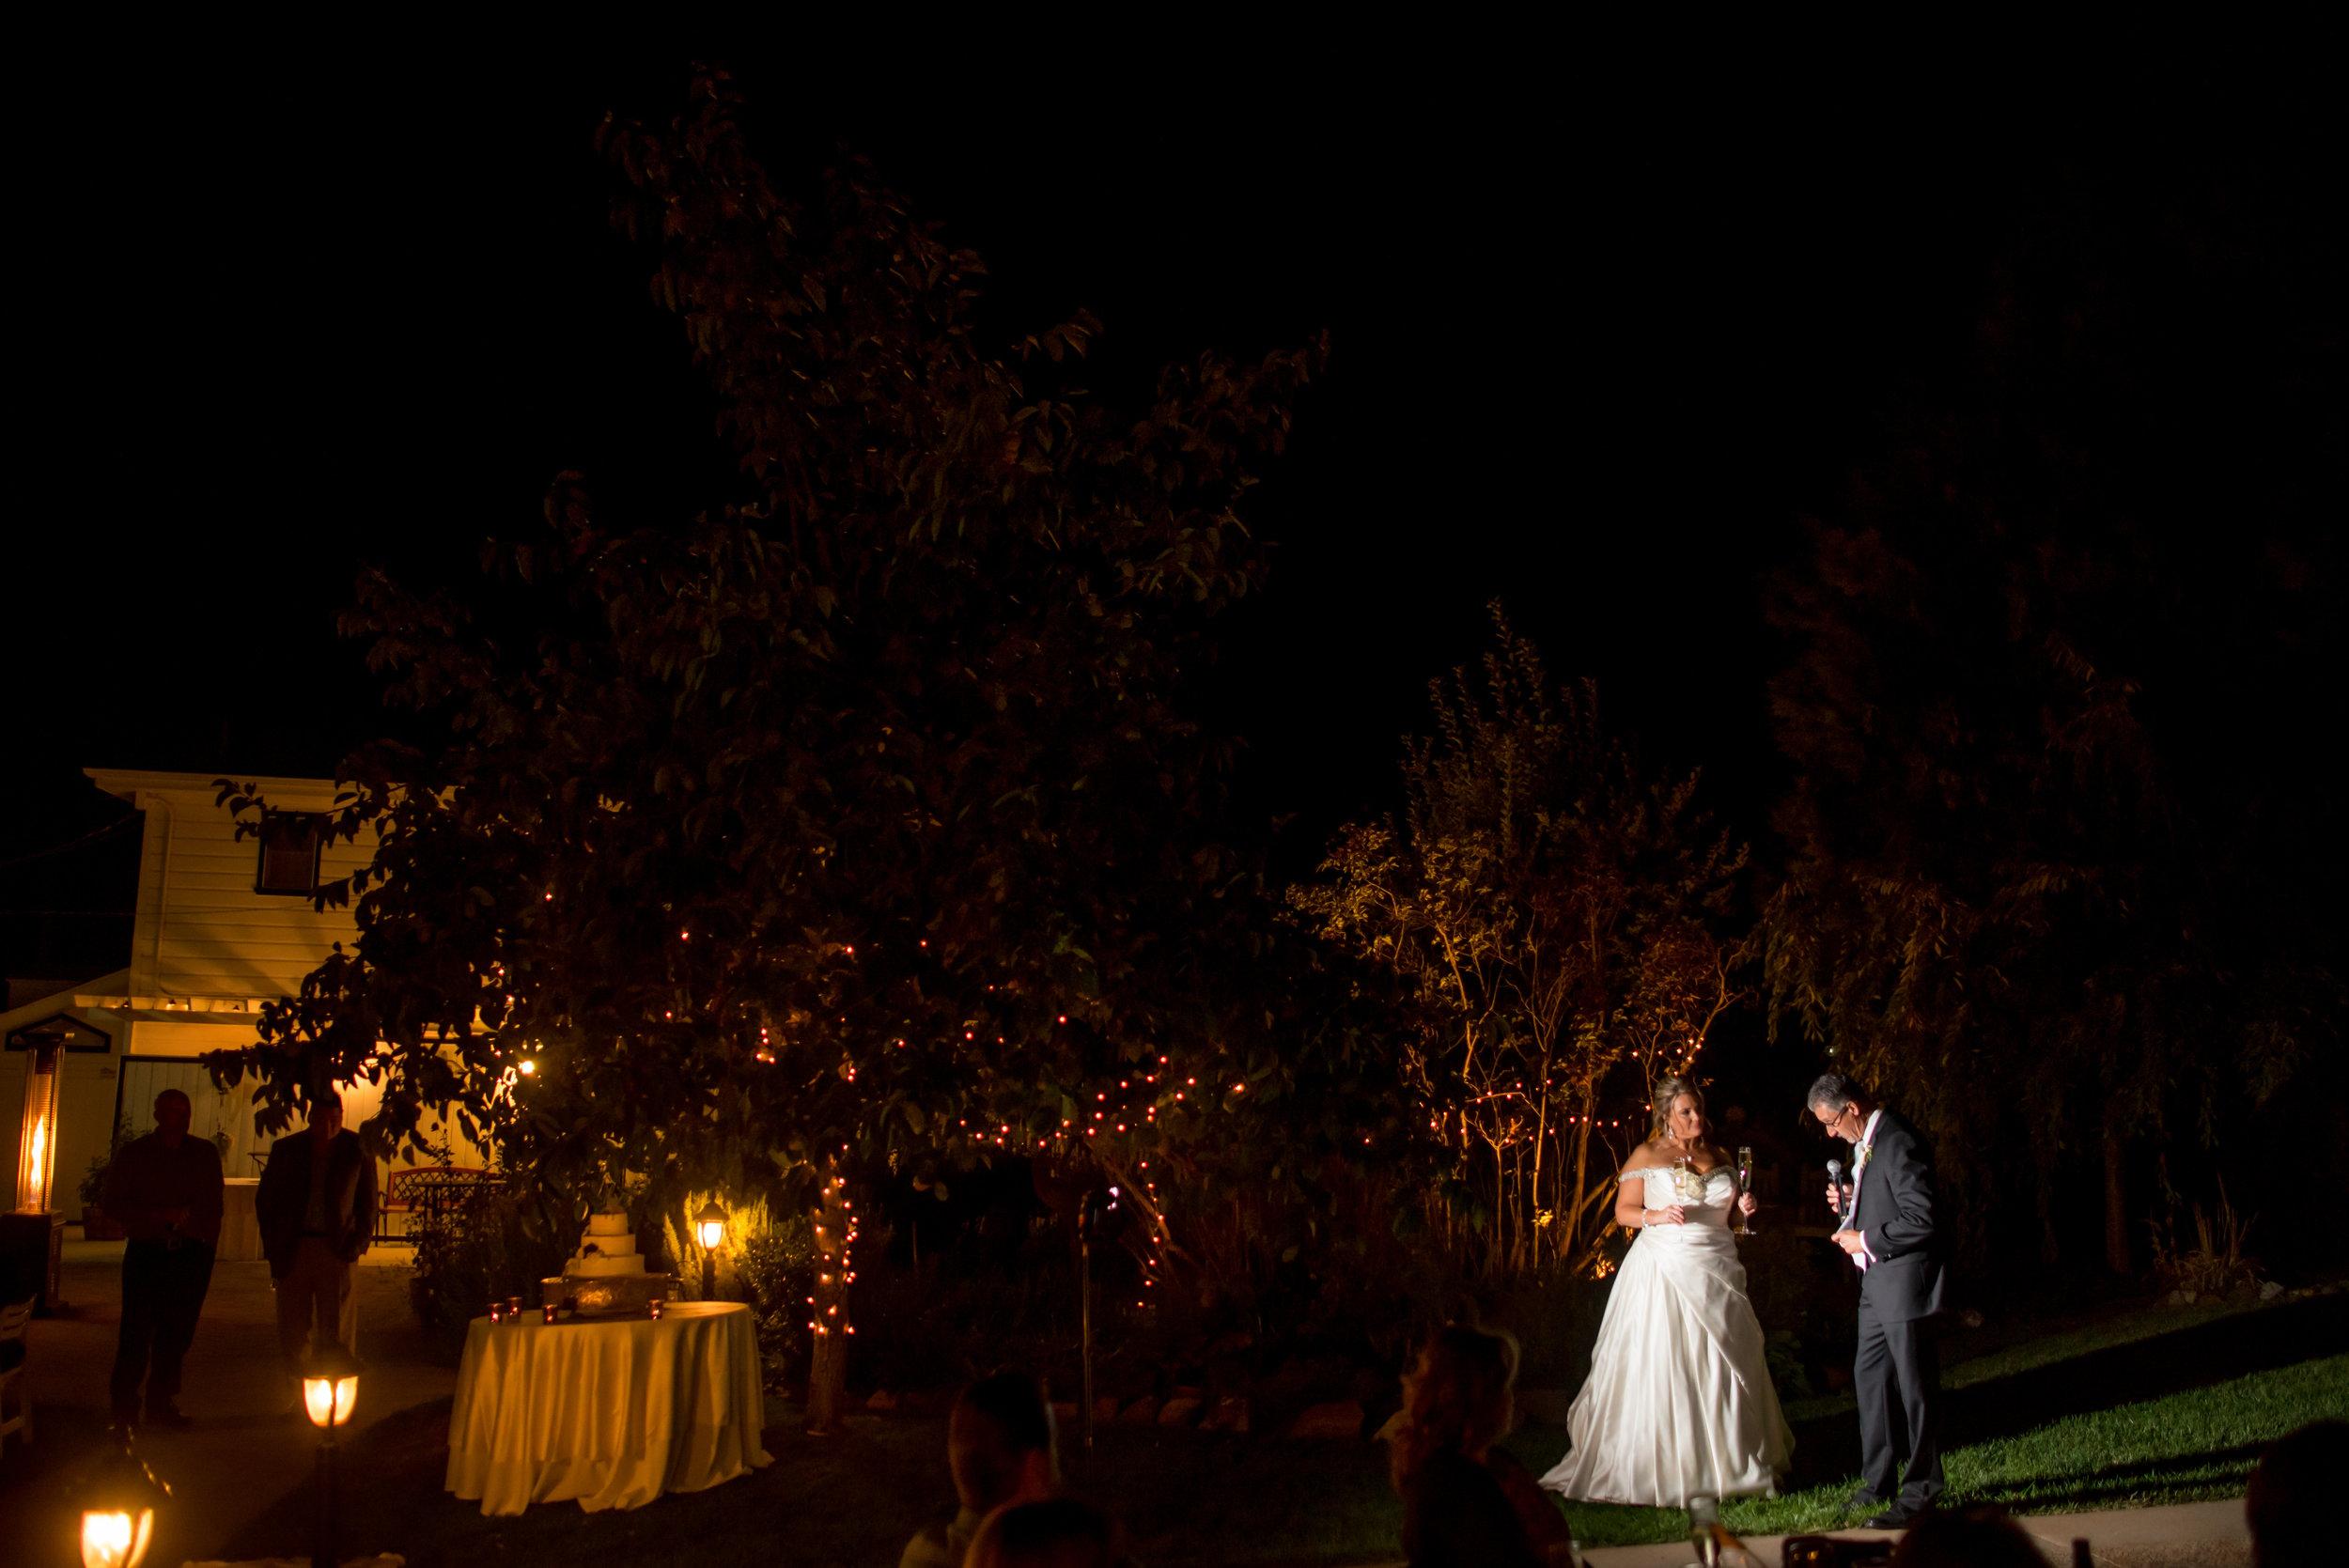 kara-craig-043-monte-verde-inn-sacramento-wedding-photographer-katherine-nicole-photography.JPG